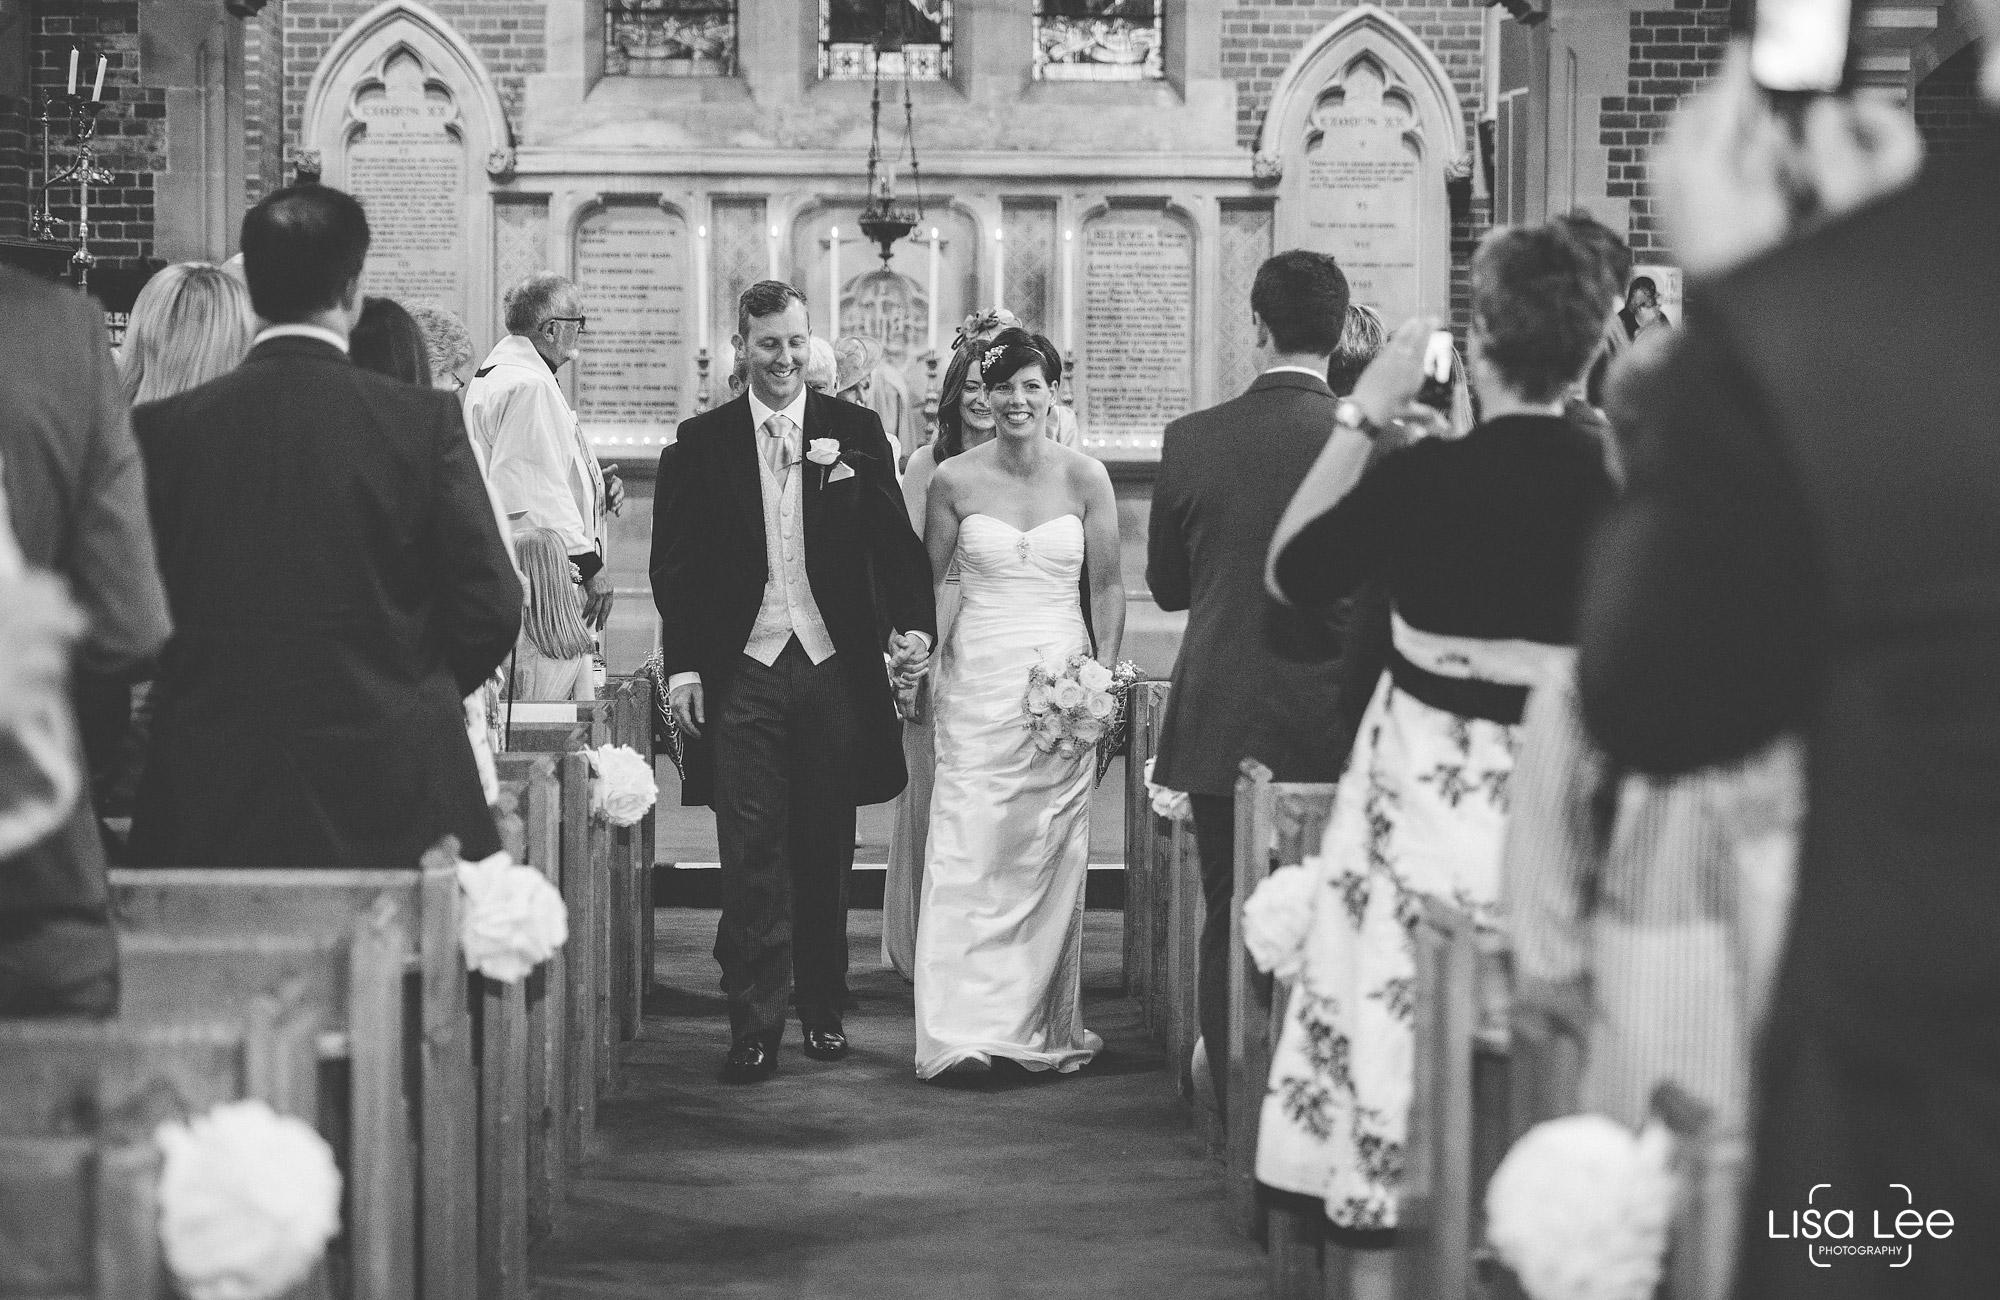 lisa-lee-wedding-photography-burton-church2.jpg